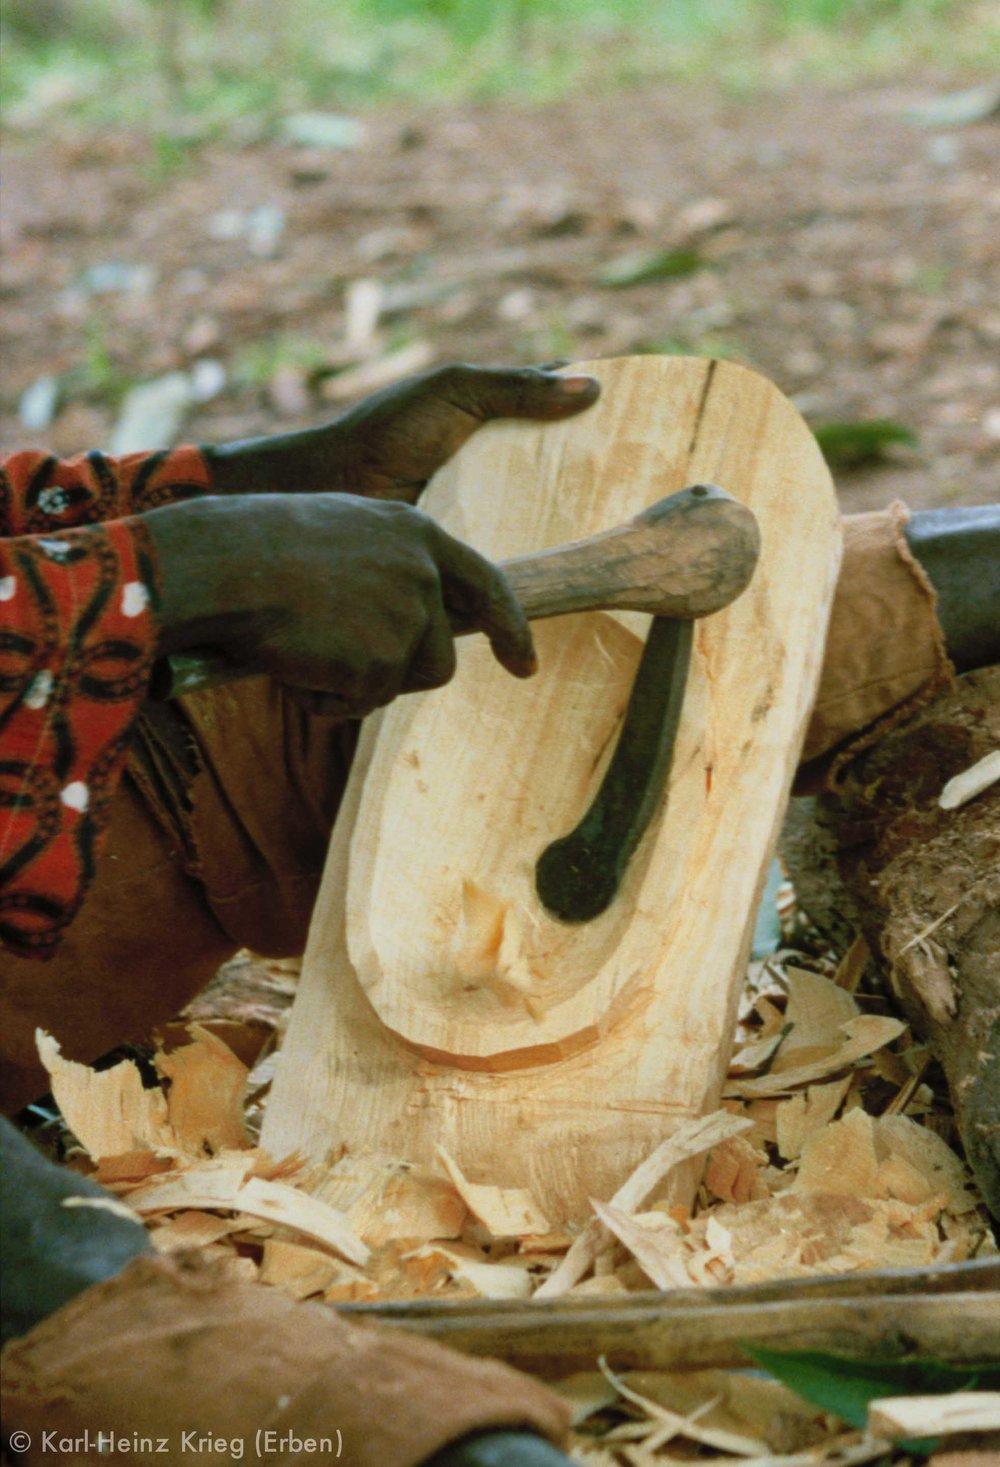 Sécondjéwin Dagnogo carving the back of the mask with an adze. Ziédougou (Region of Boundiali, Côte d'Ivoire), 1980.Photo: Karl-Heinz Krieg